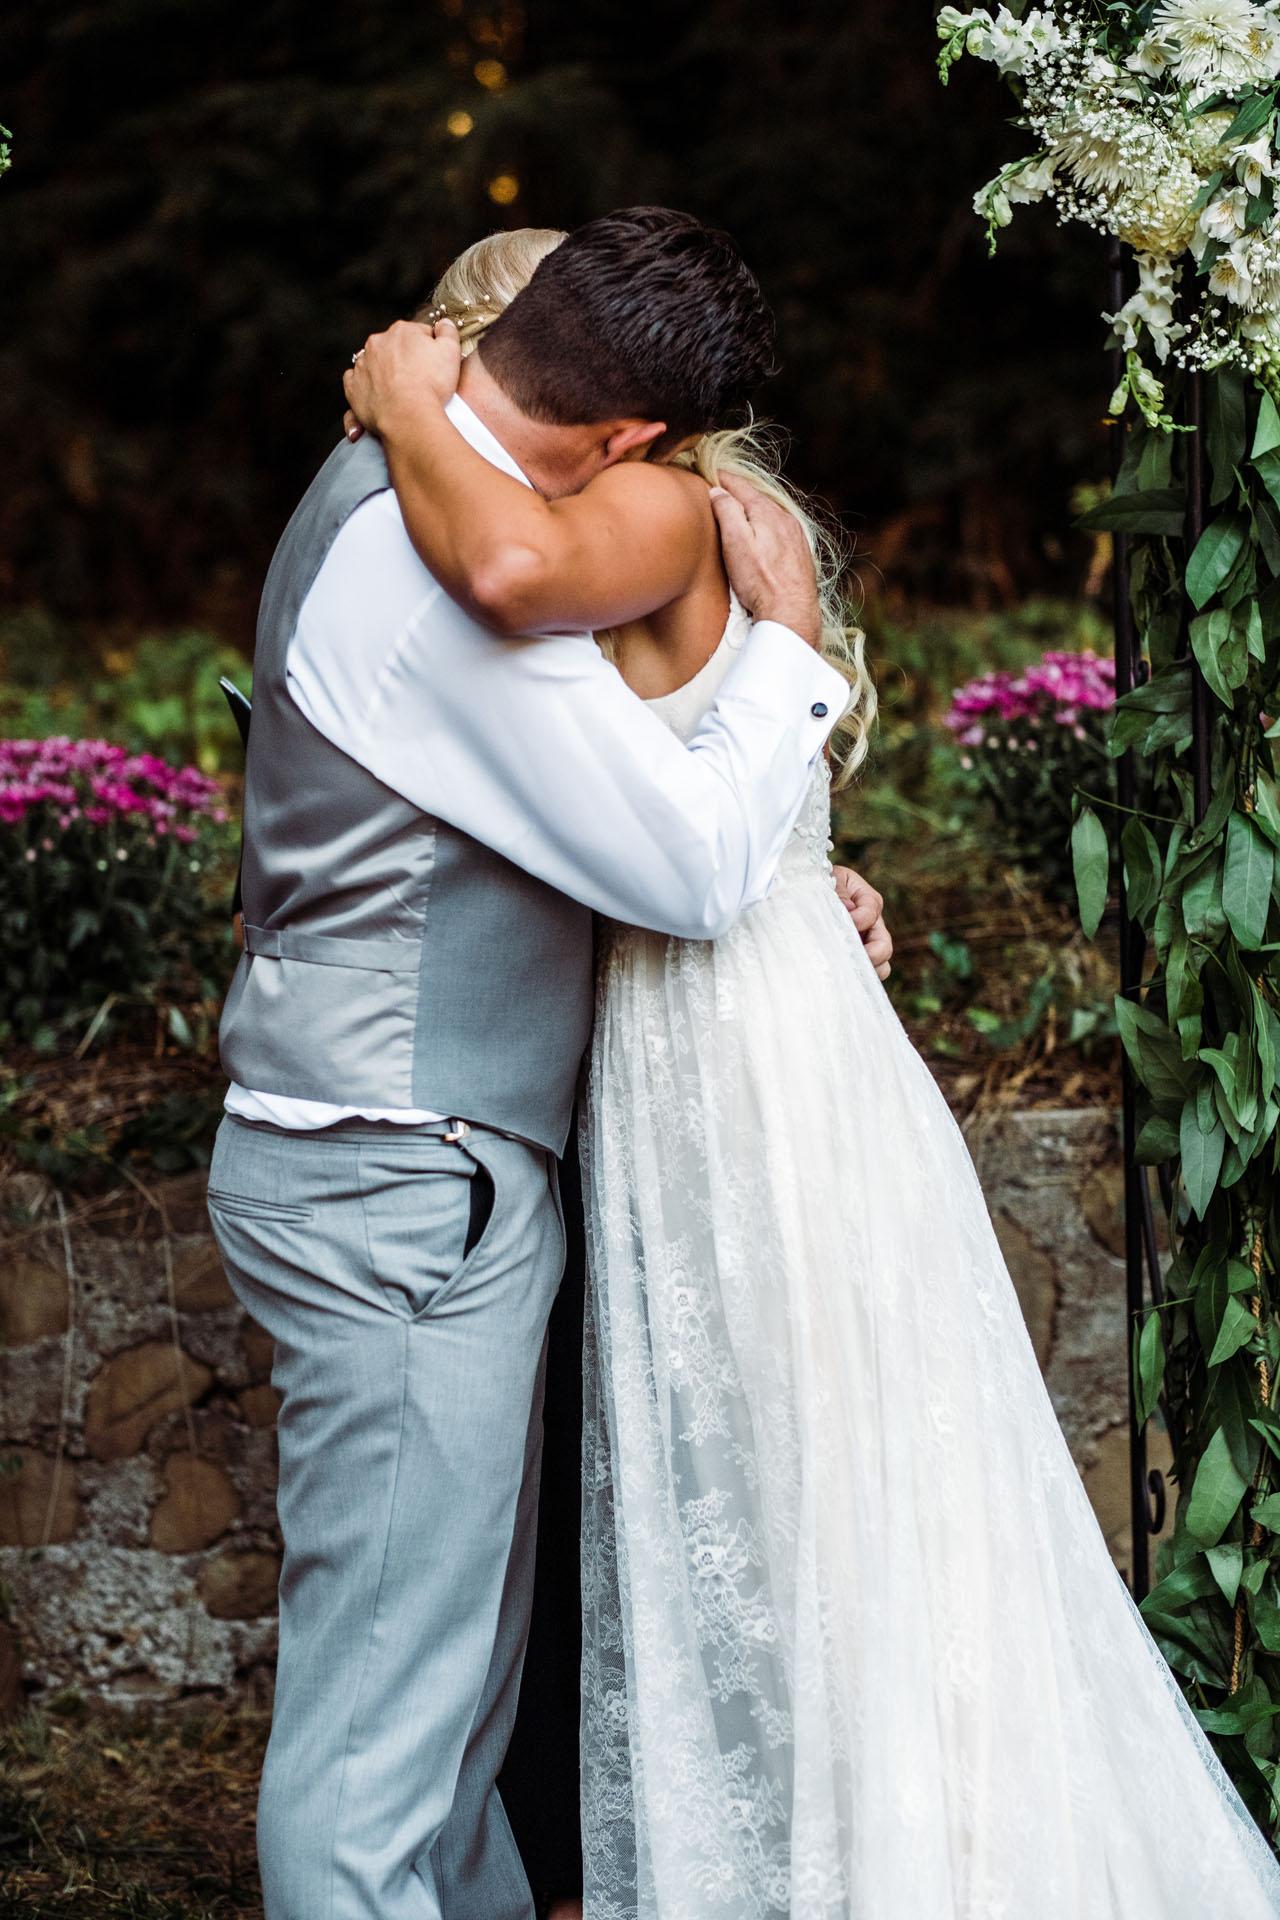 10-7-17 Devon and Jordan's Wedding-114.jpg